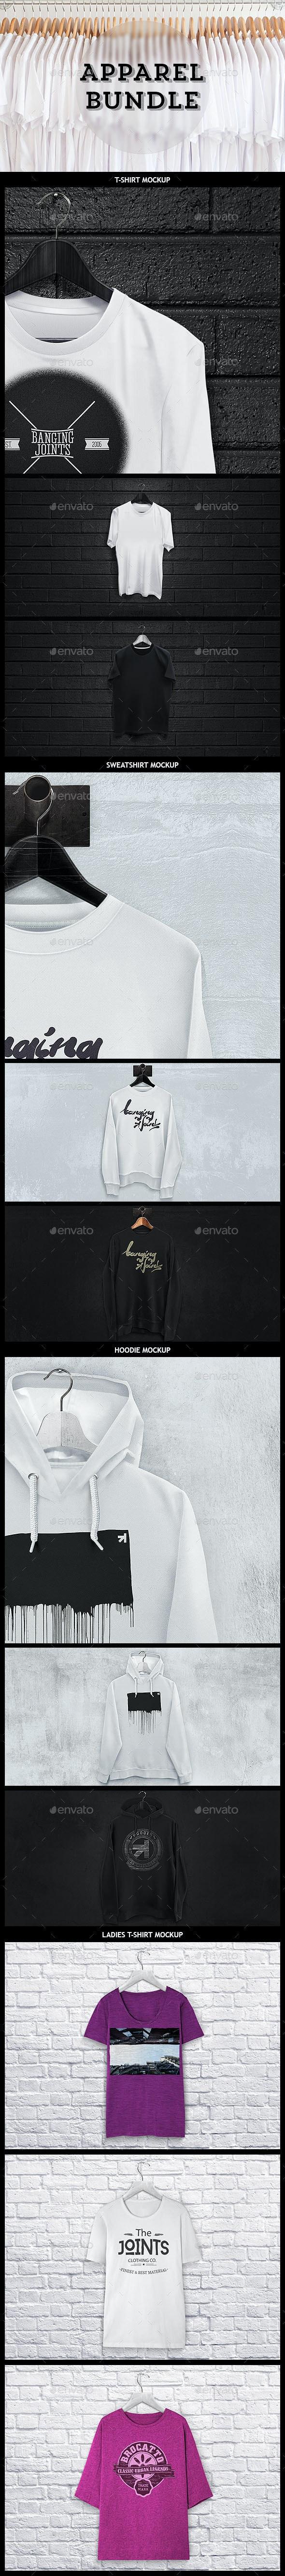 Apparel Mockup Bundle - T-shirt / Sweat / Hoodie  - Apparel Product Mock-Ups